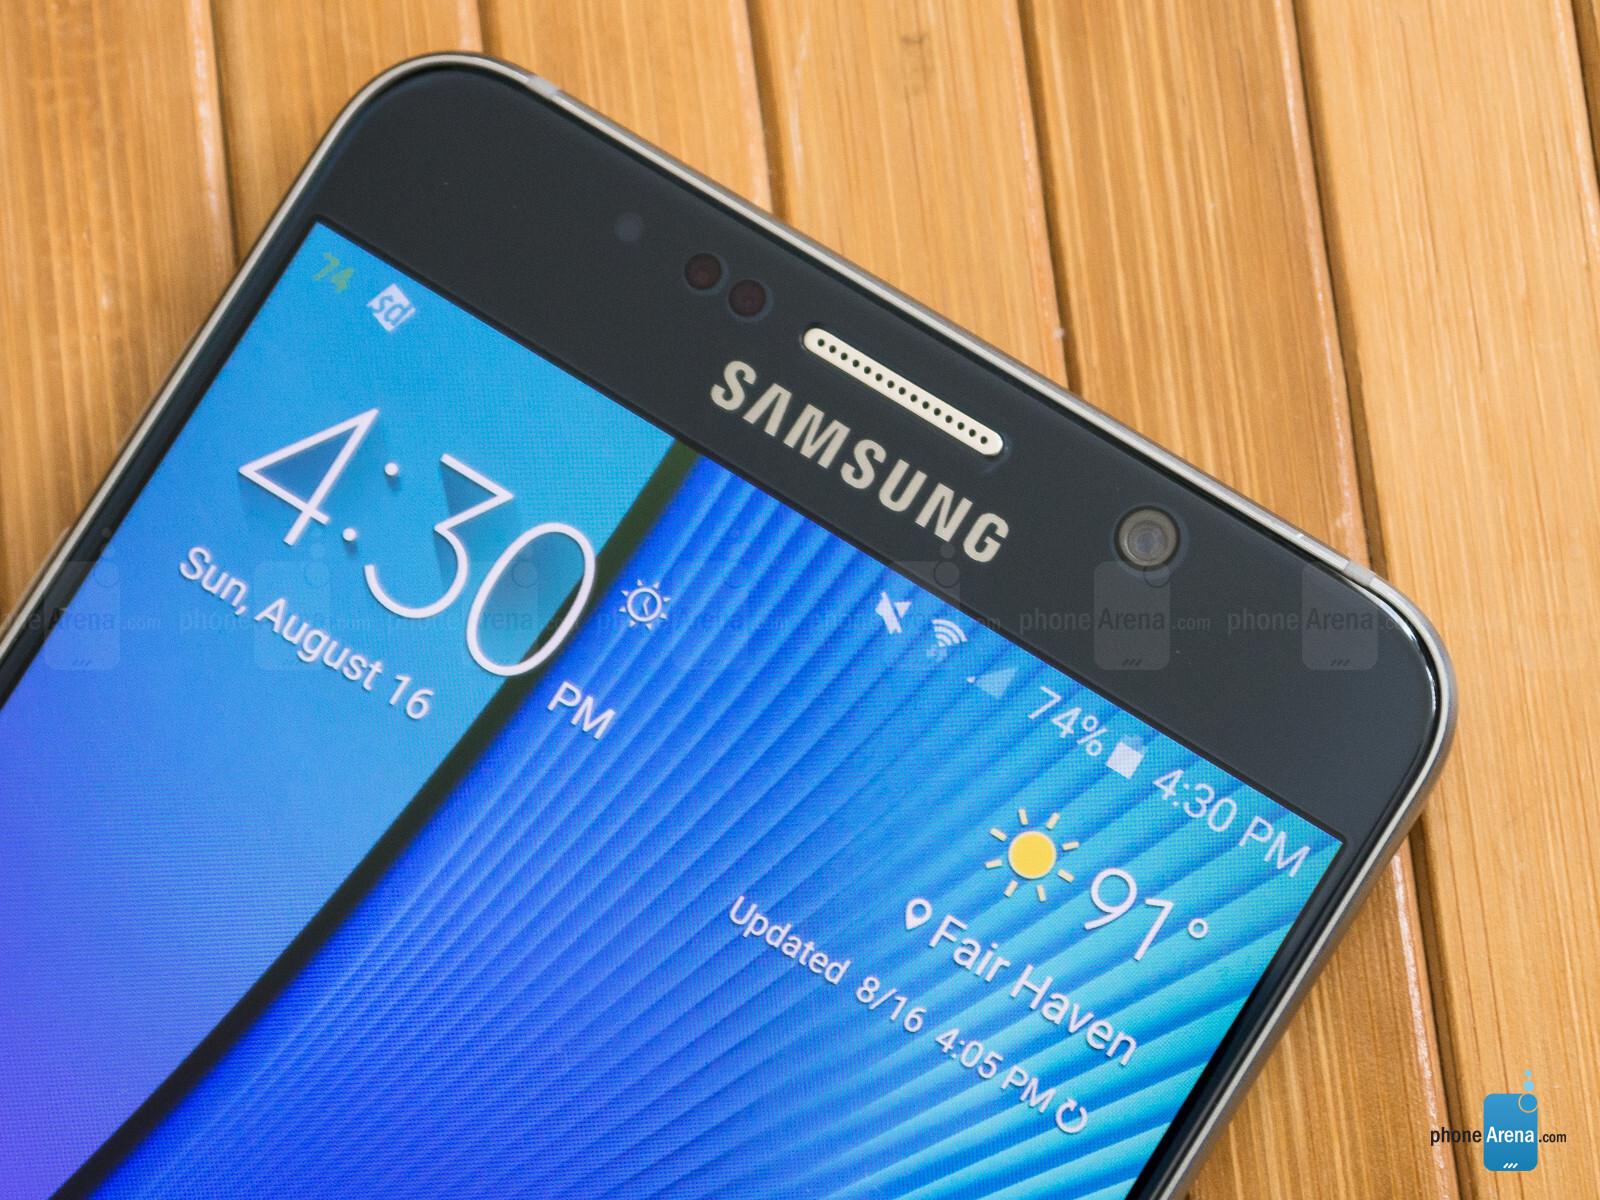 Samsung Universe A8+ (2018) develop